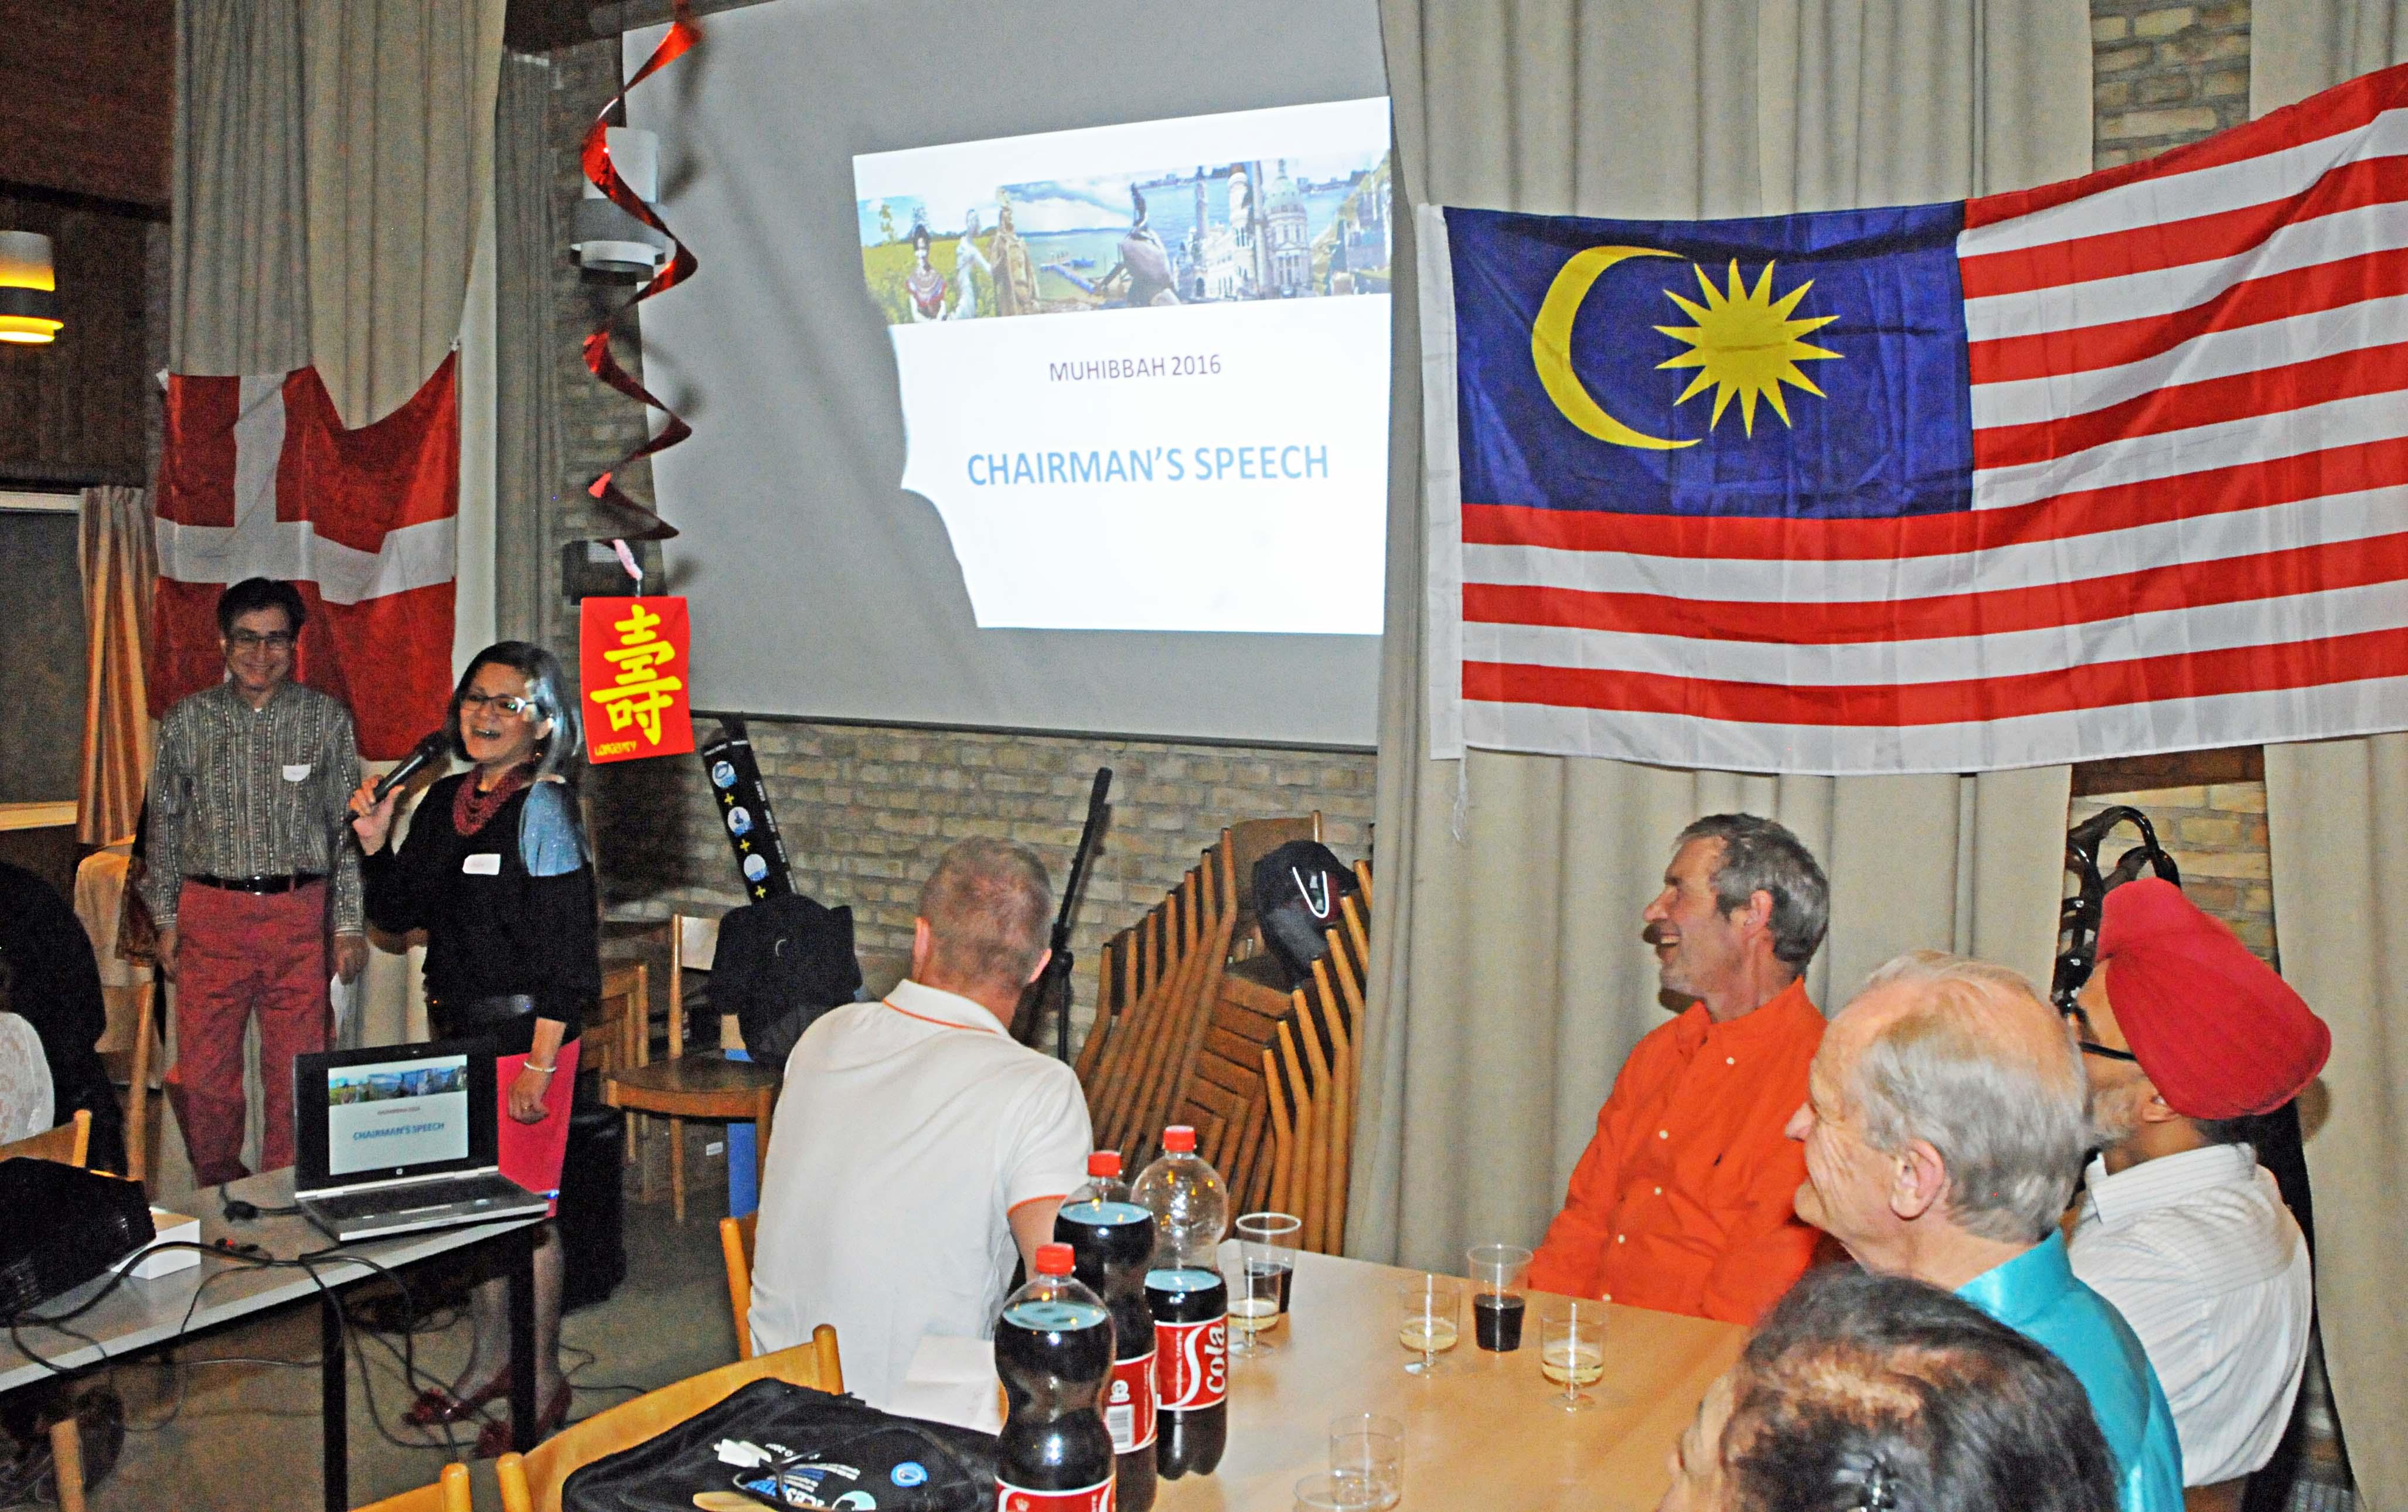 ! Photo HASSE FERROLD MALAYSIA DENMARK MUHIBBAH 27 02 2016 1